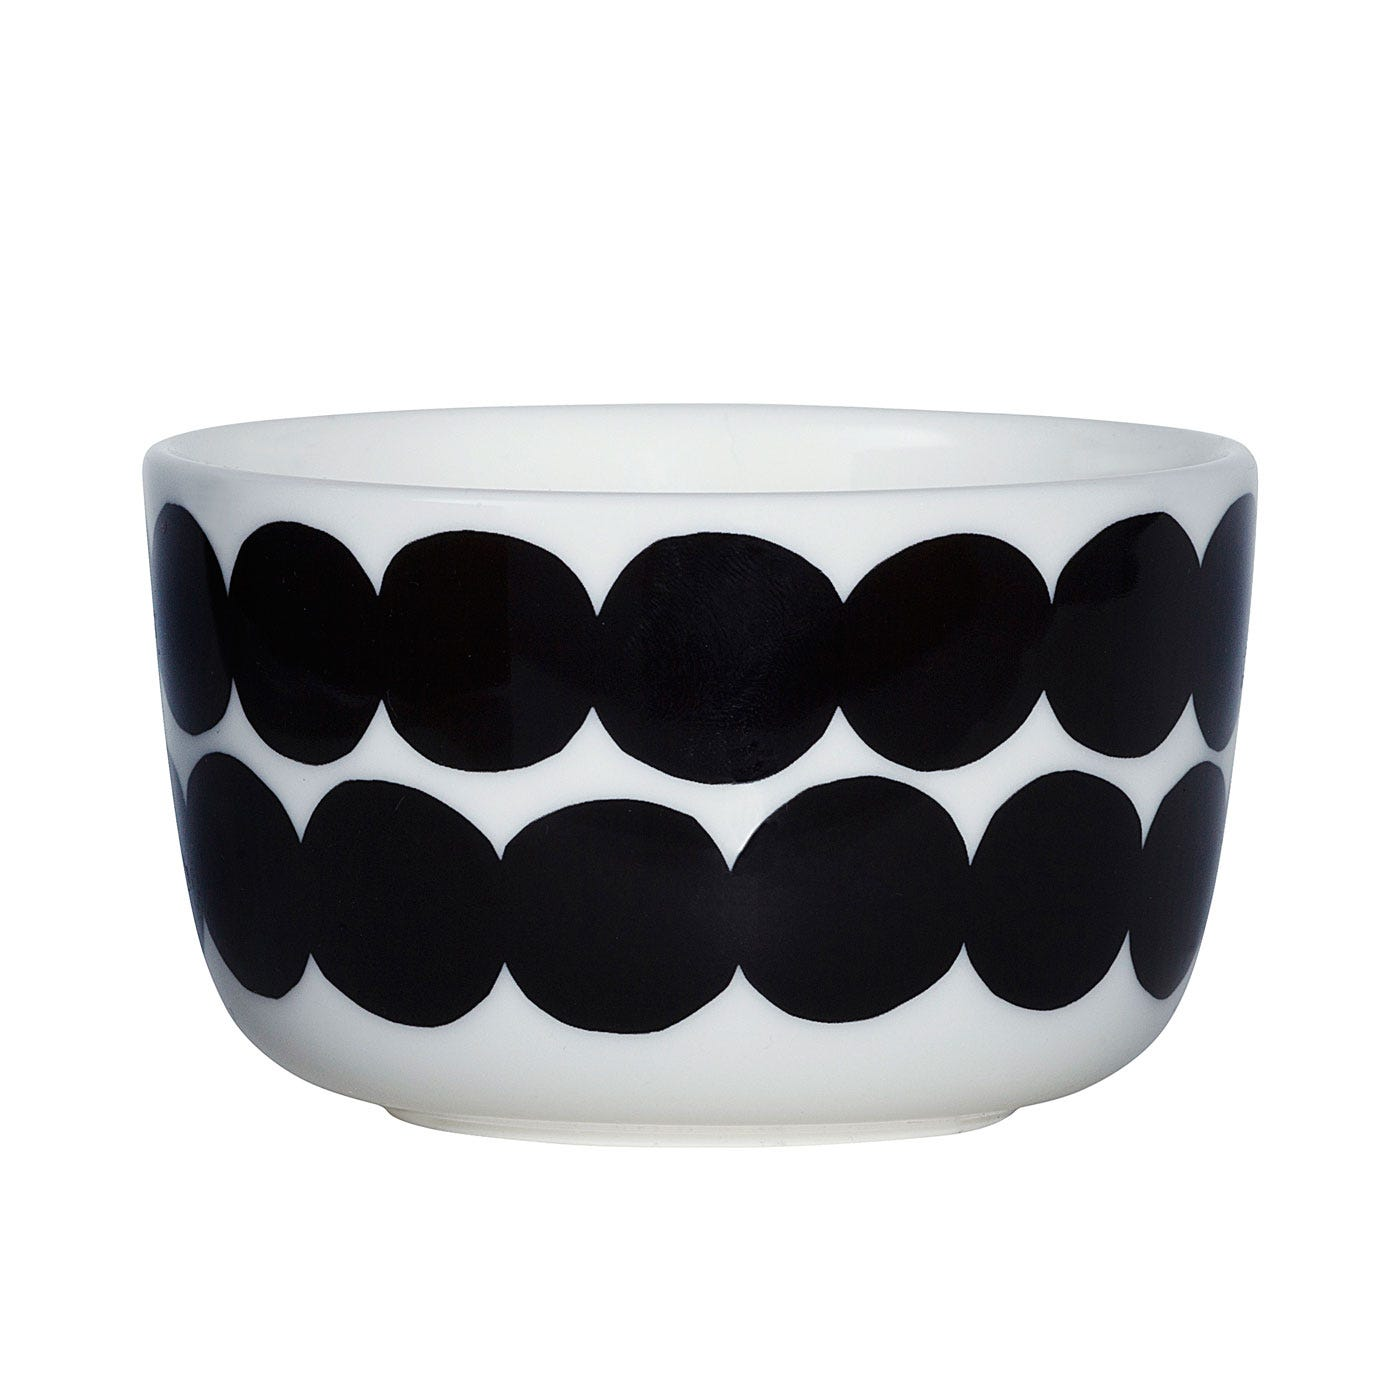 Rasymatto Bowl 9cm